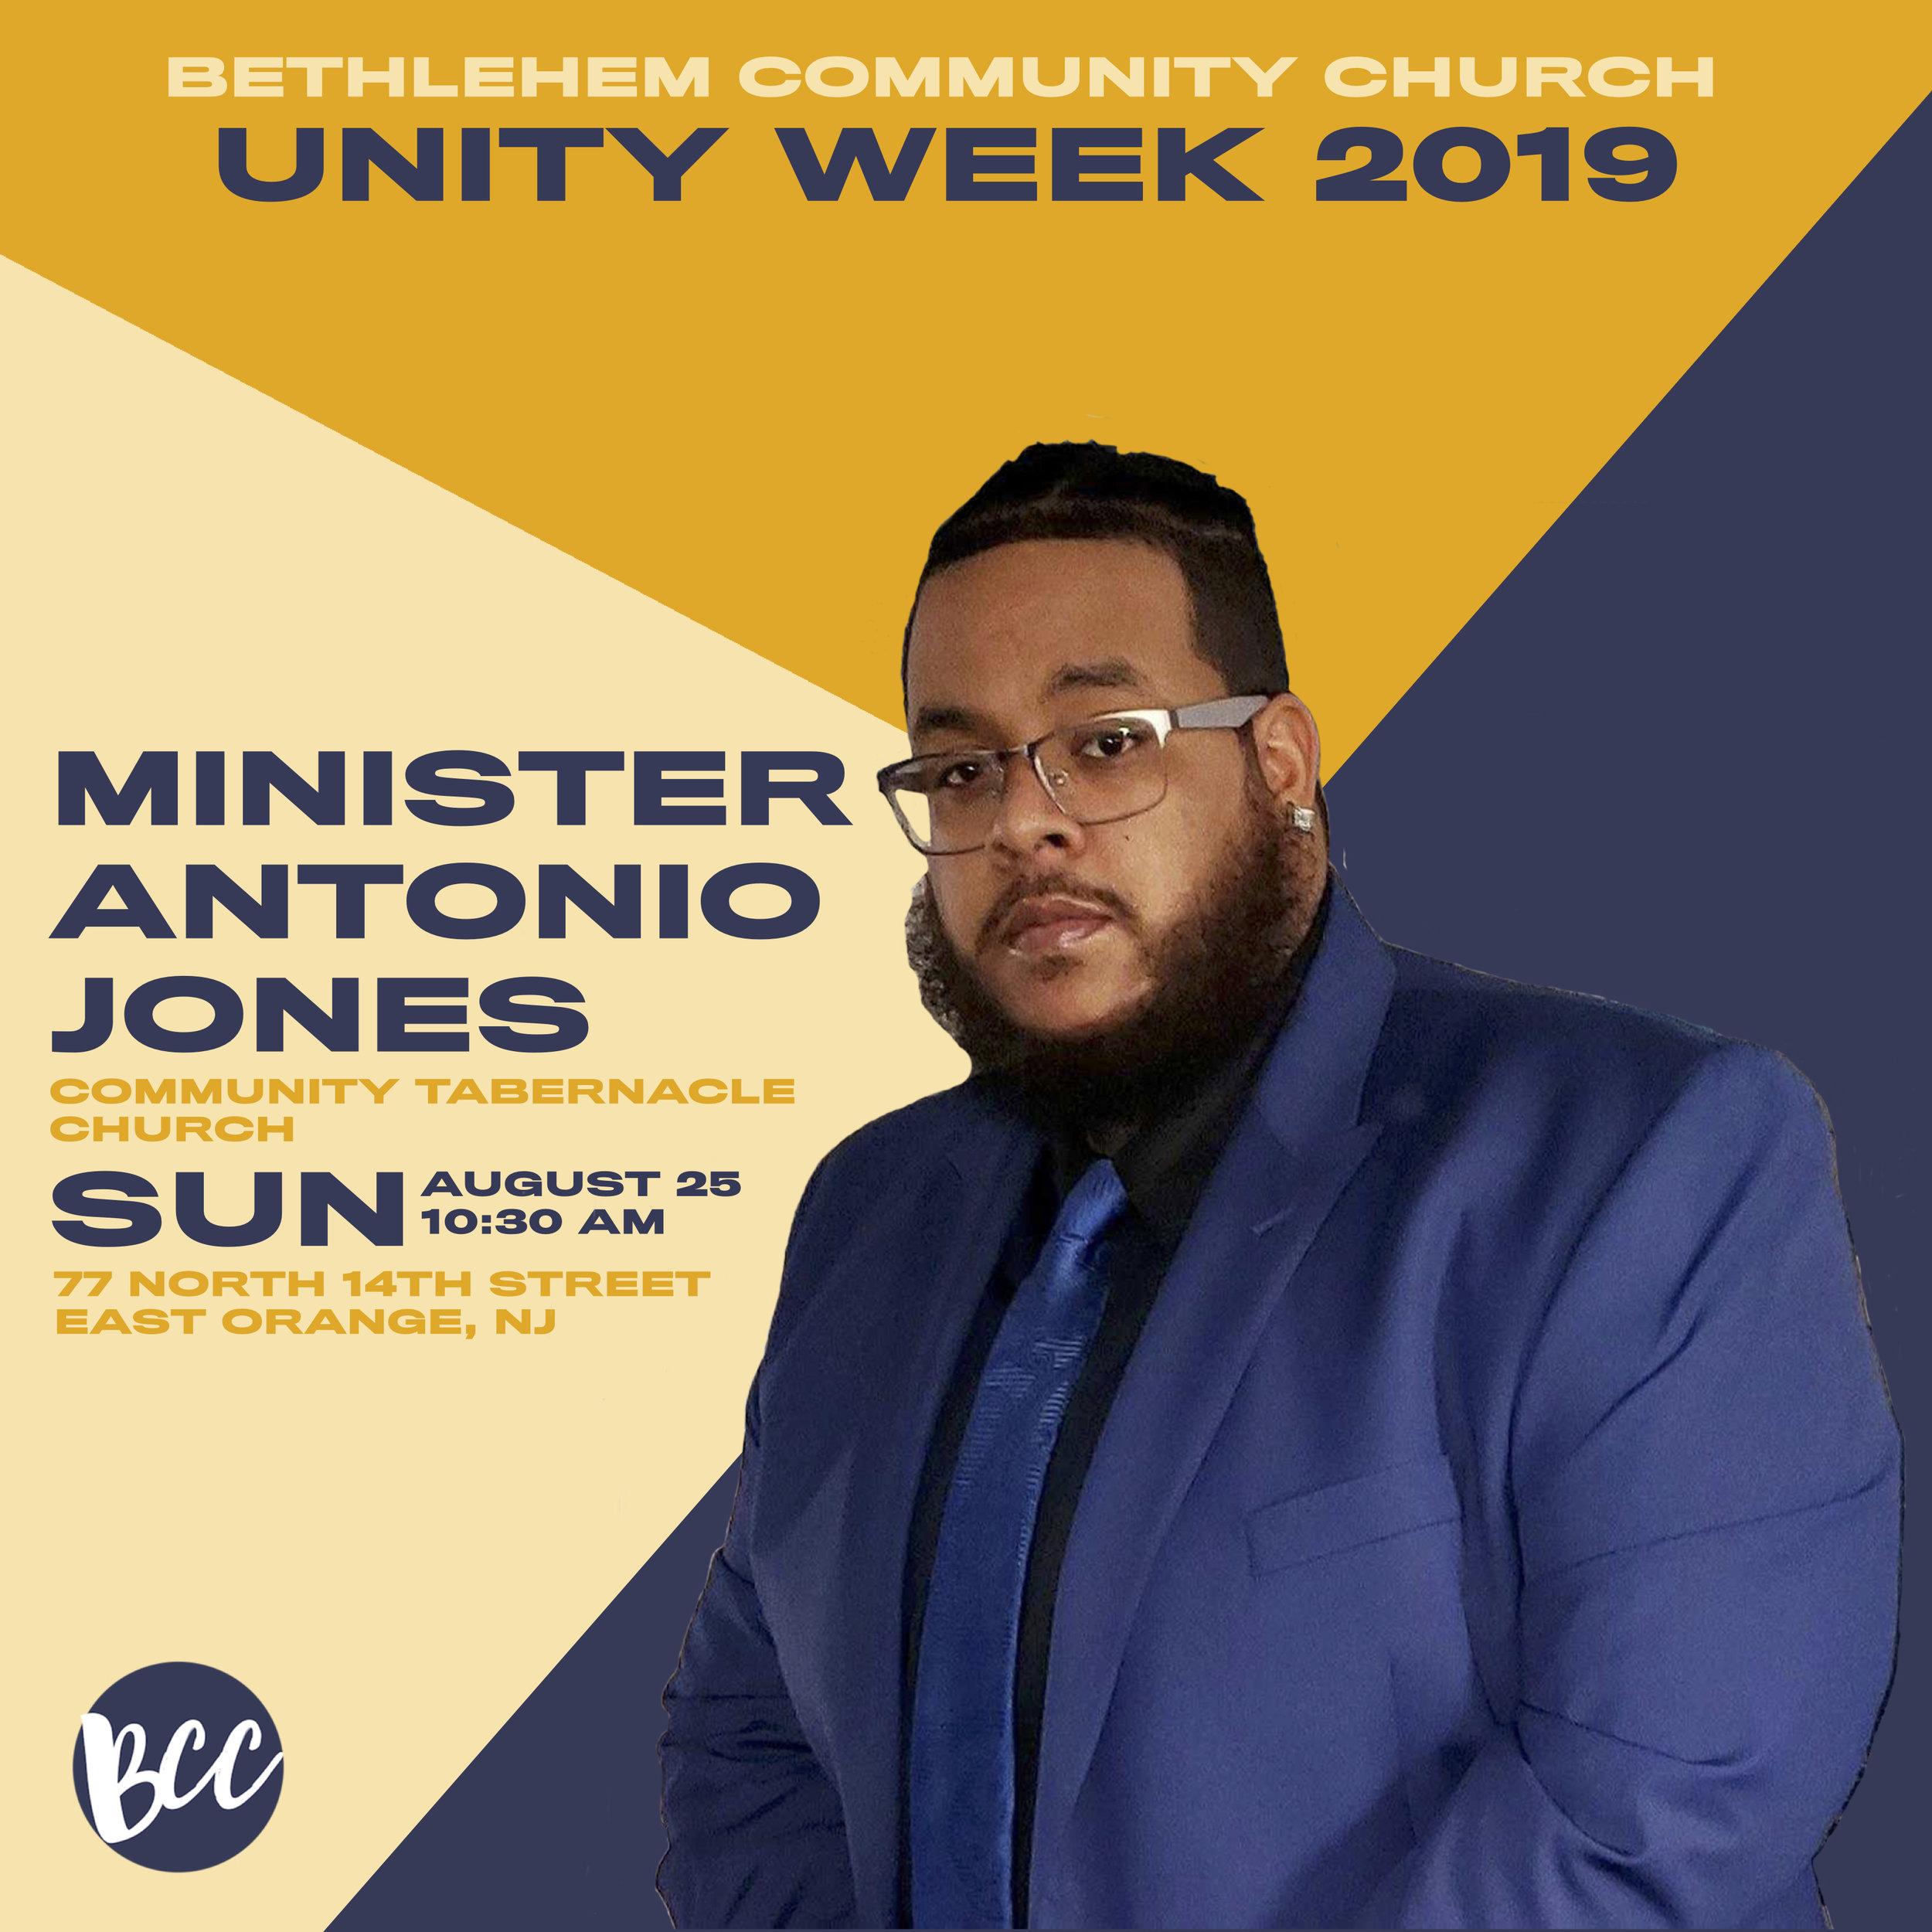 Unity WeekAntonio Jones IG post.jpg